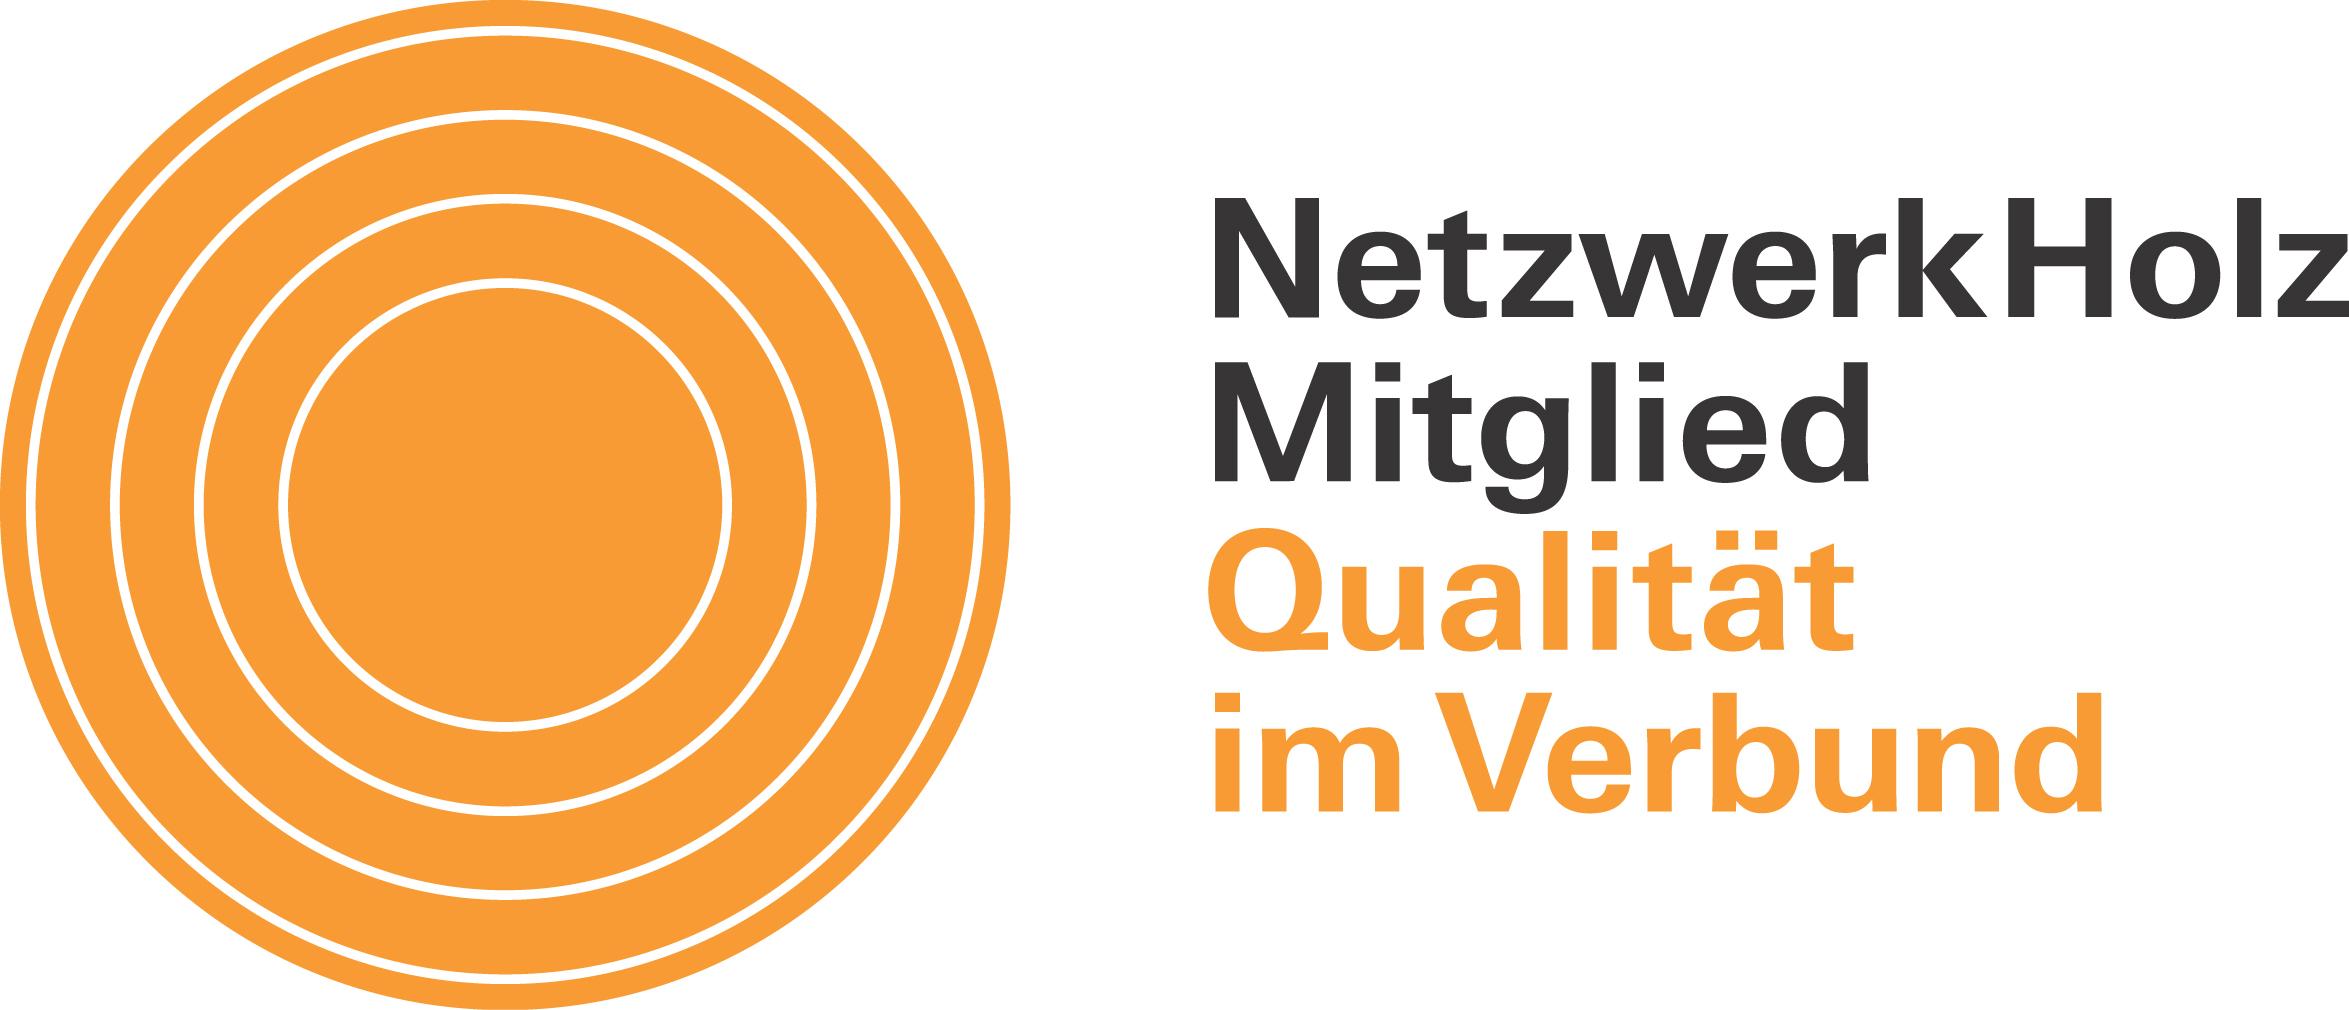 nh_logo_mitglied